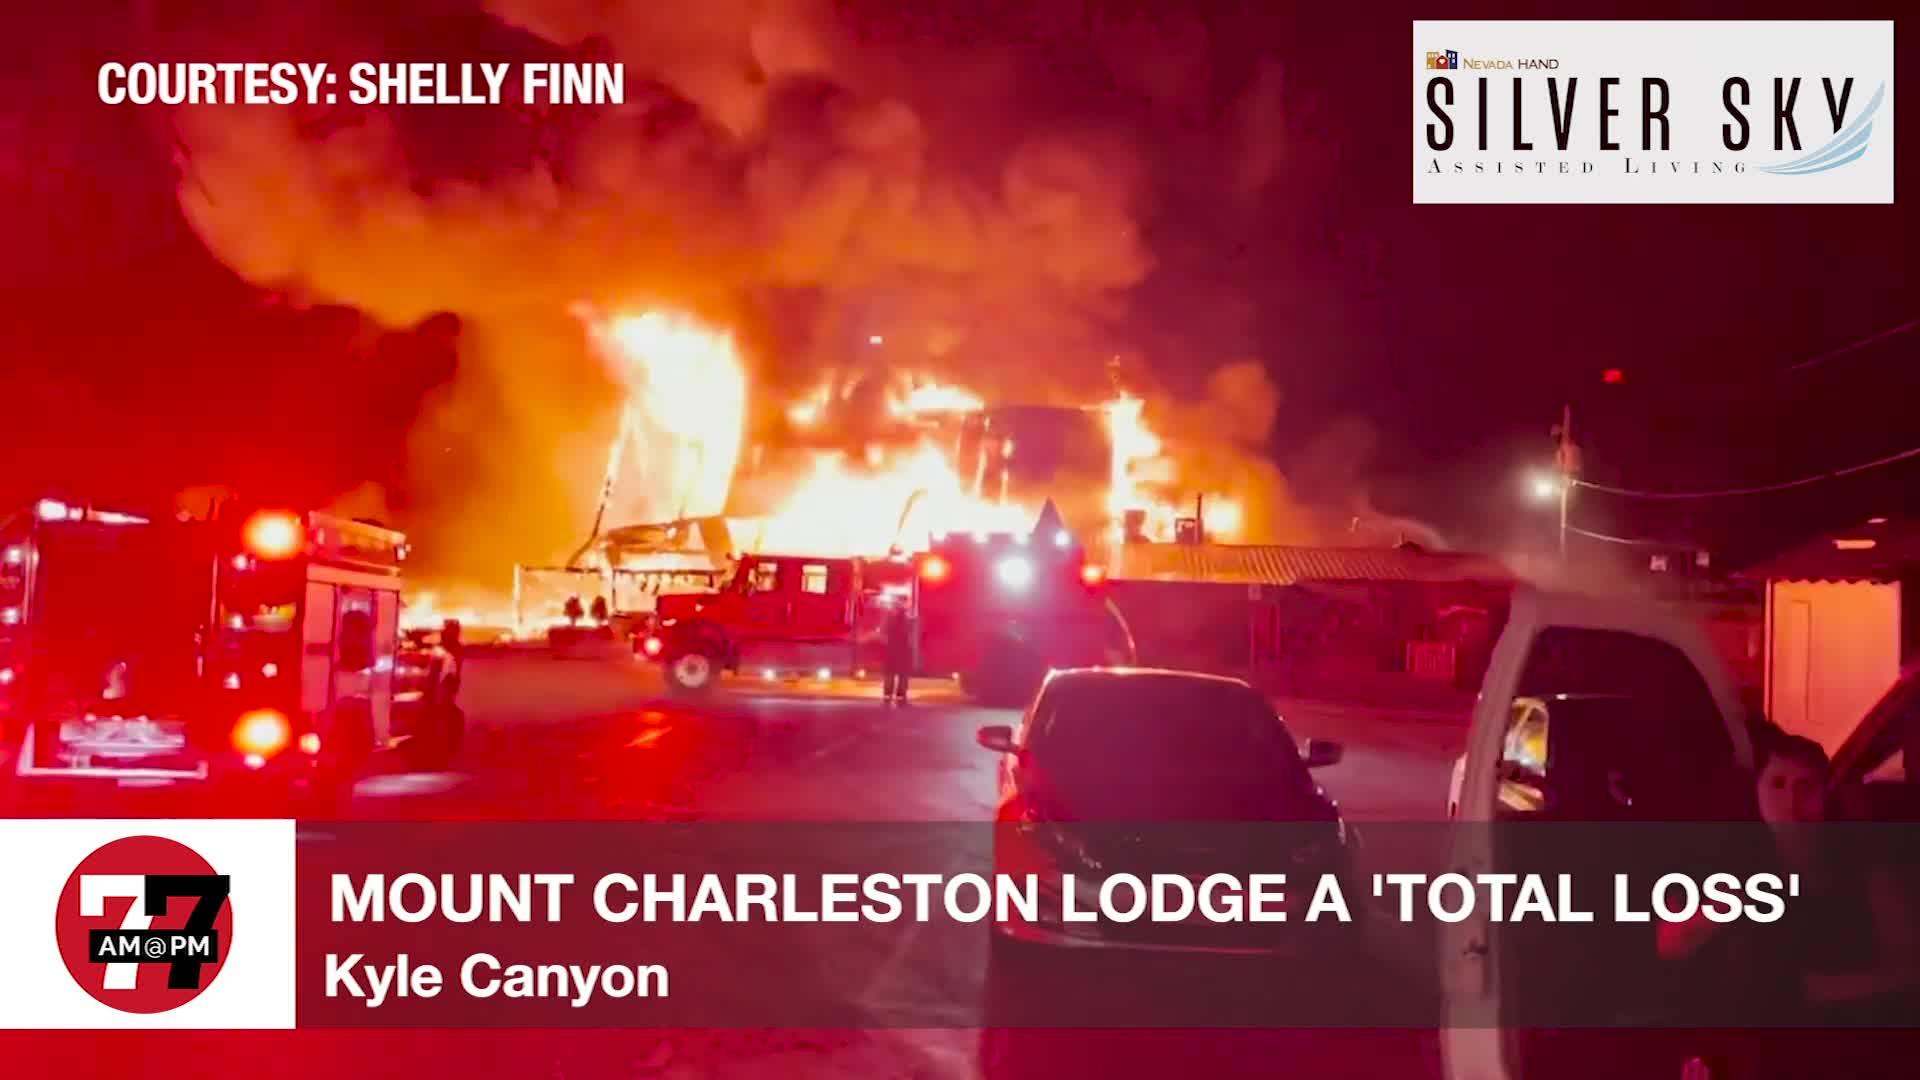 7@7PM Mount Charleston Lodge 'Total Loss'